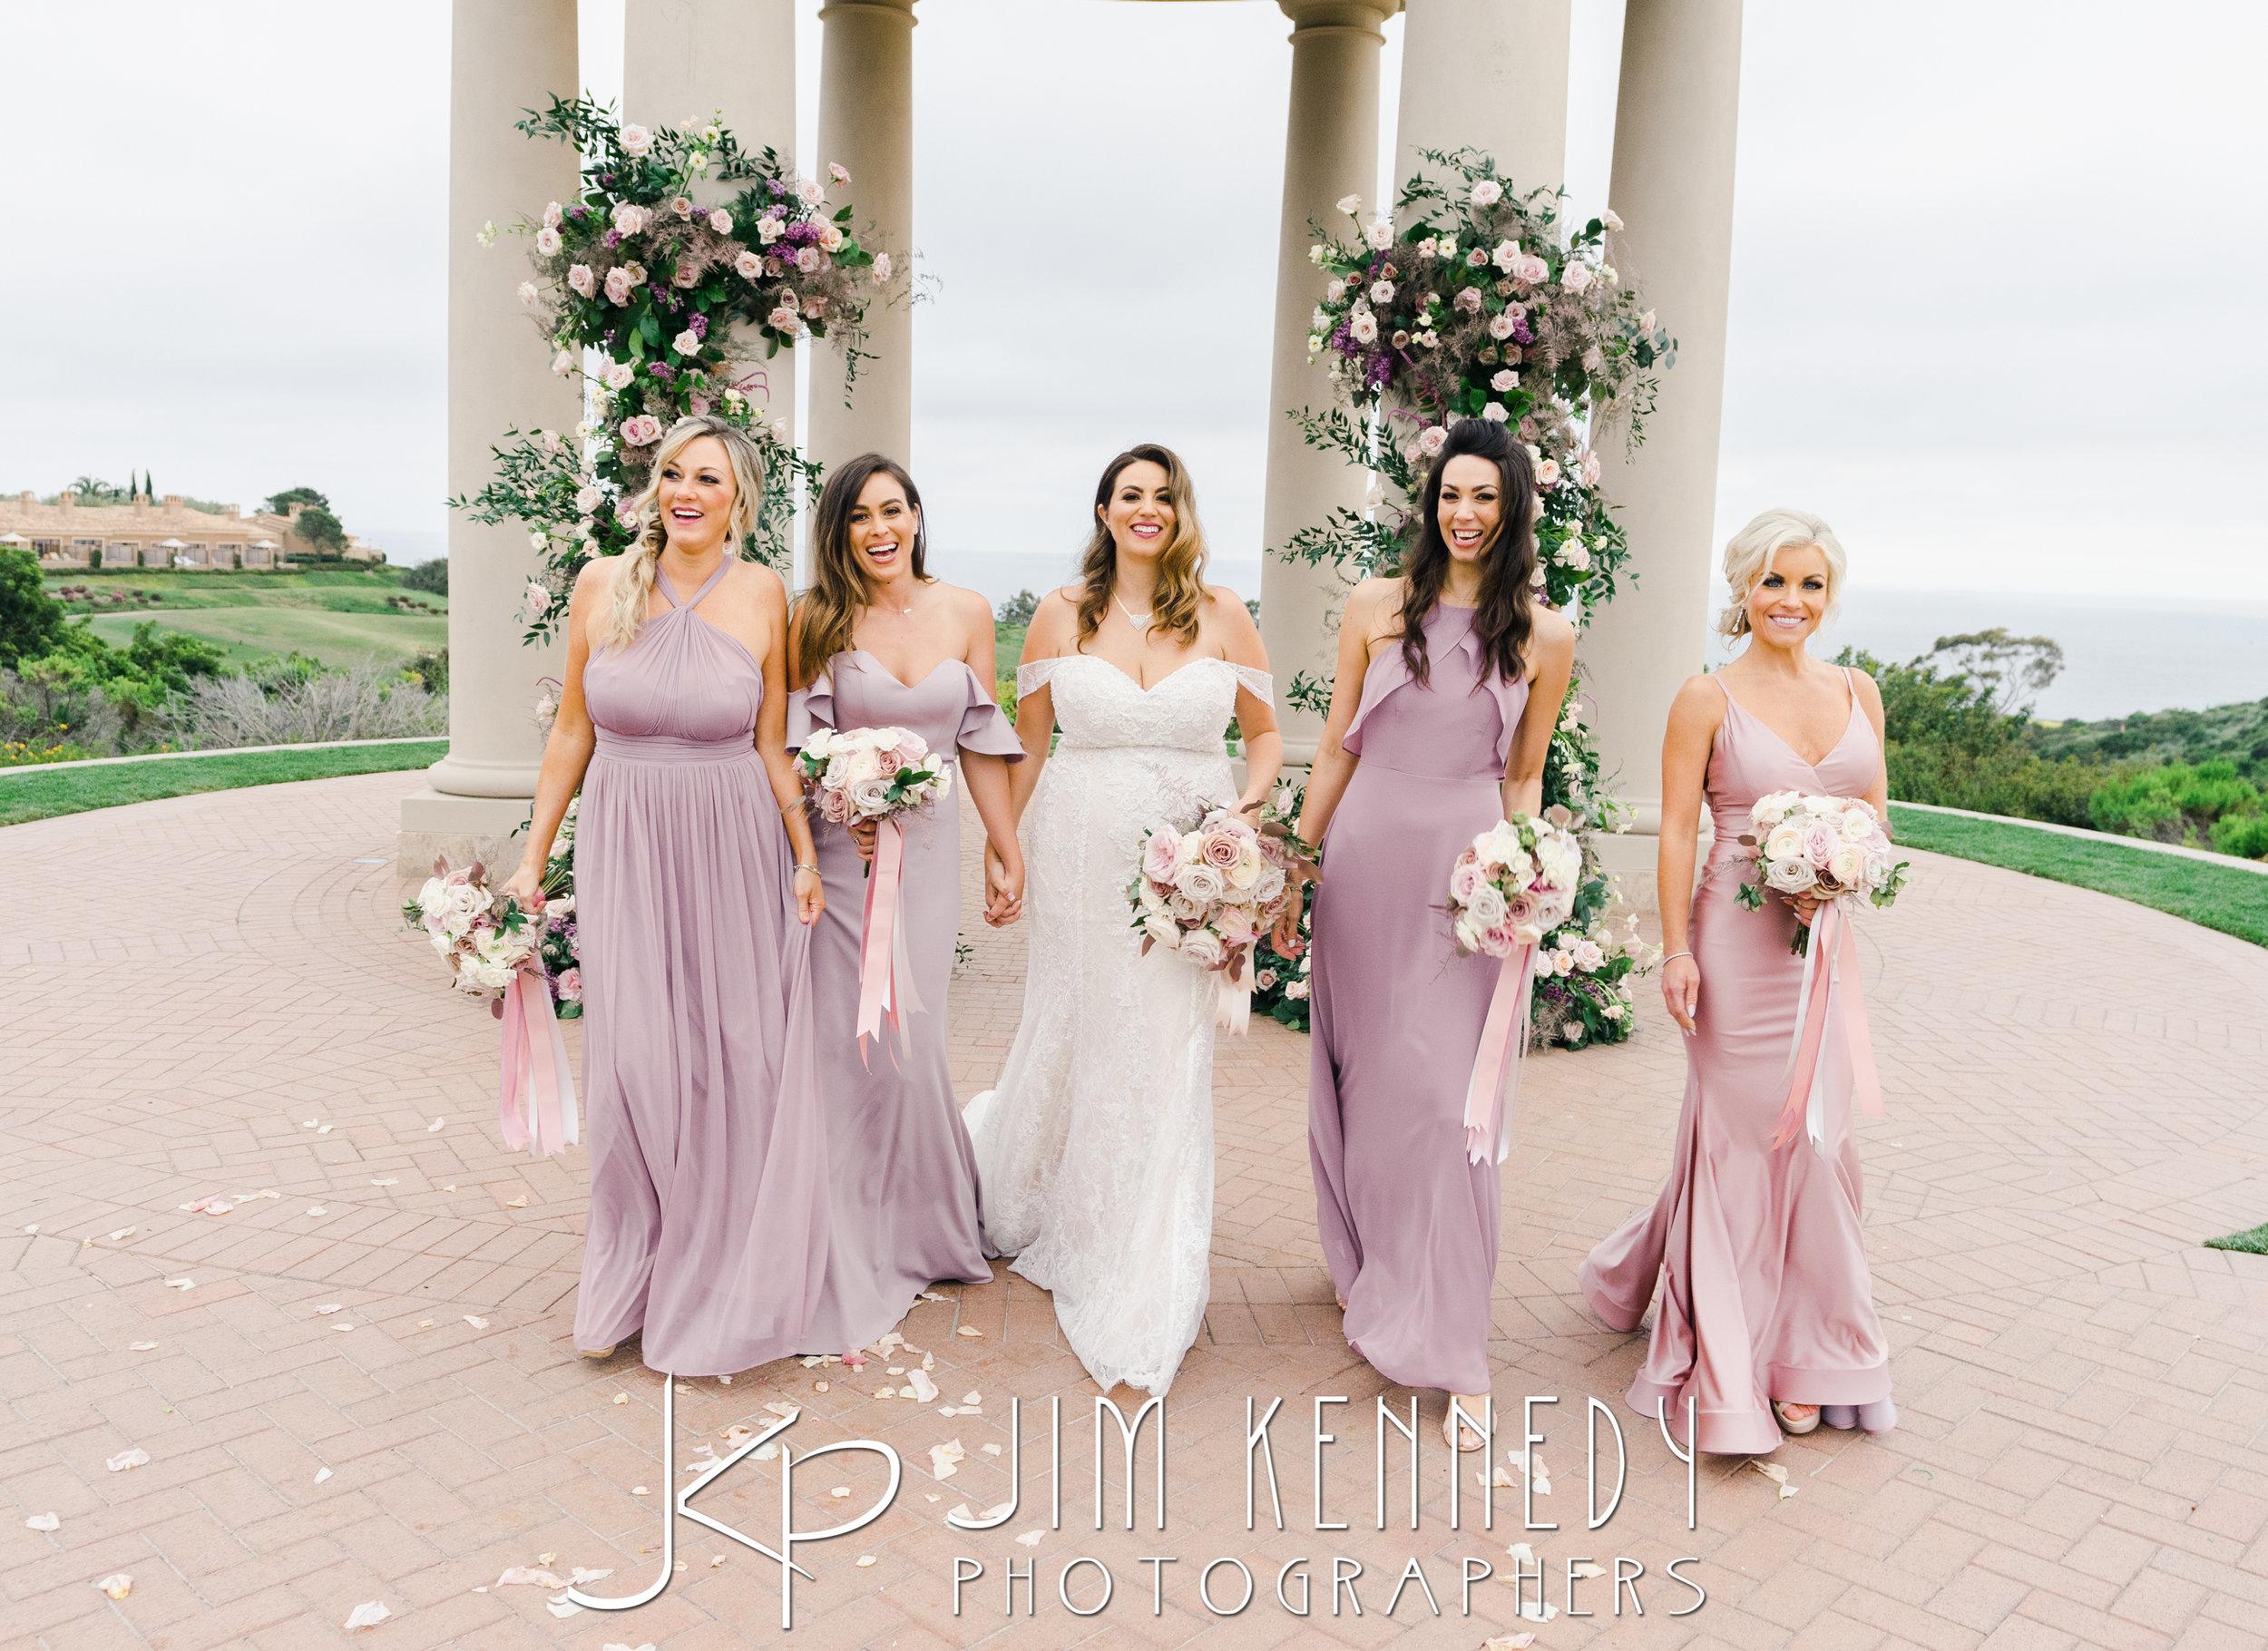 pelican-hill-wedding-jim-kenedy-photographers_0158.JPG